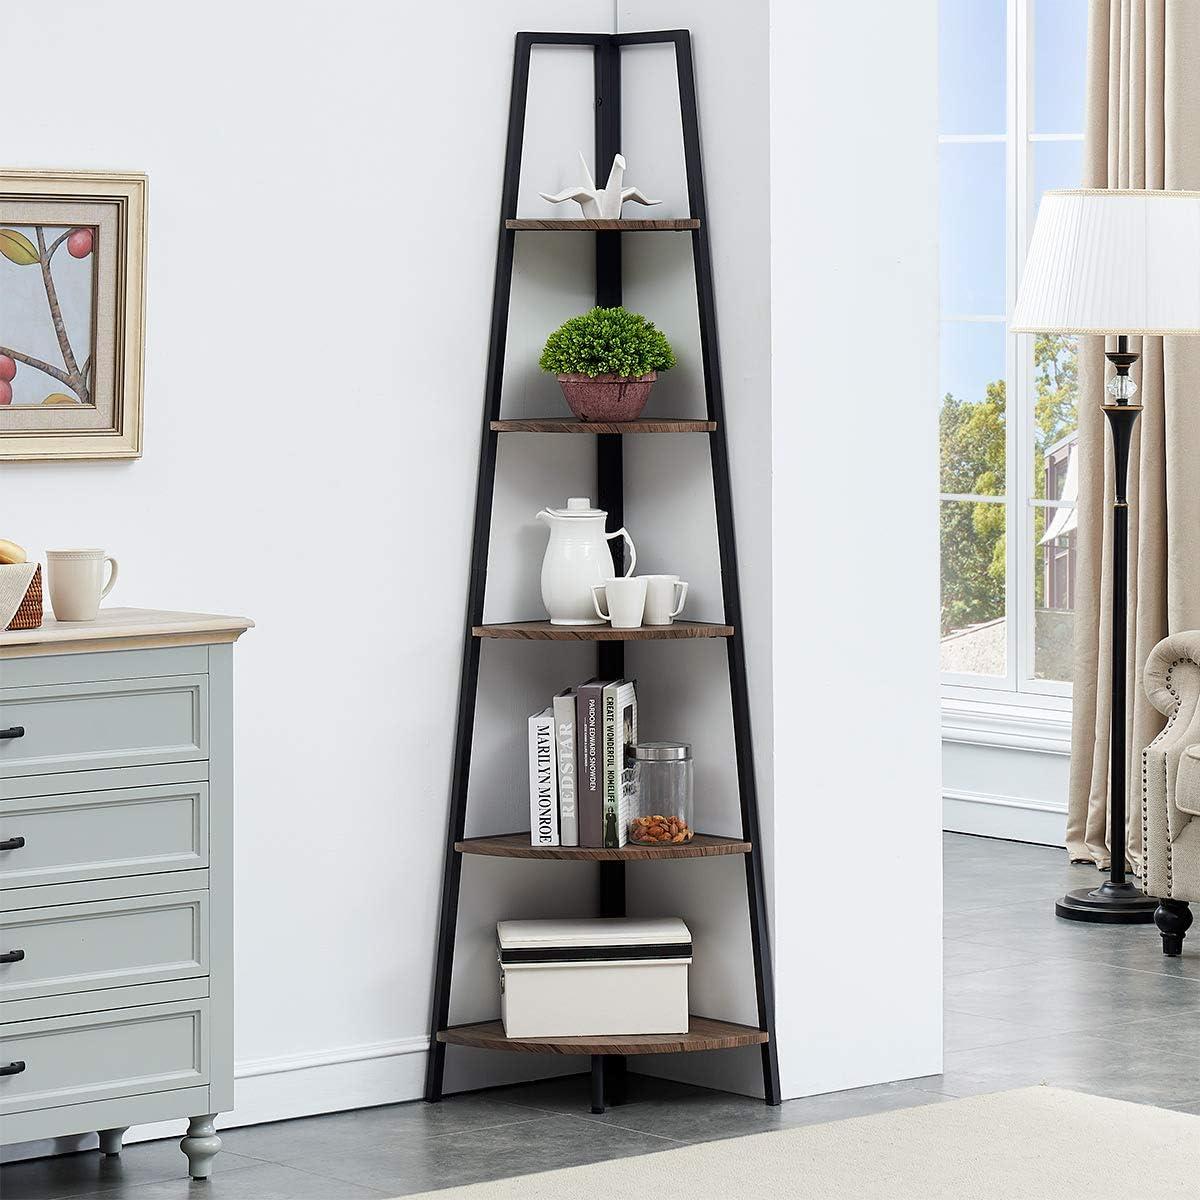 O/&K FURNITURE 5-Shelf Corner Etagere Bookcase for Small Space Industrial Tall Corner Bookshelf Gray-Brown Finish